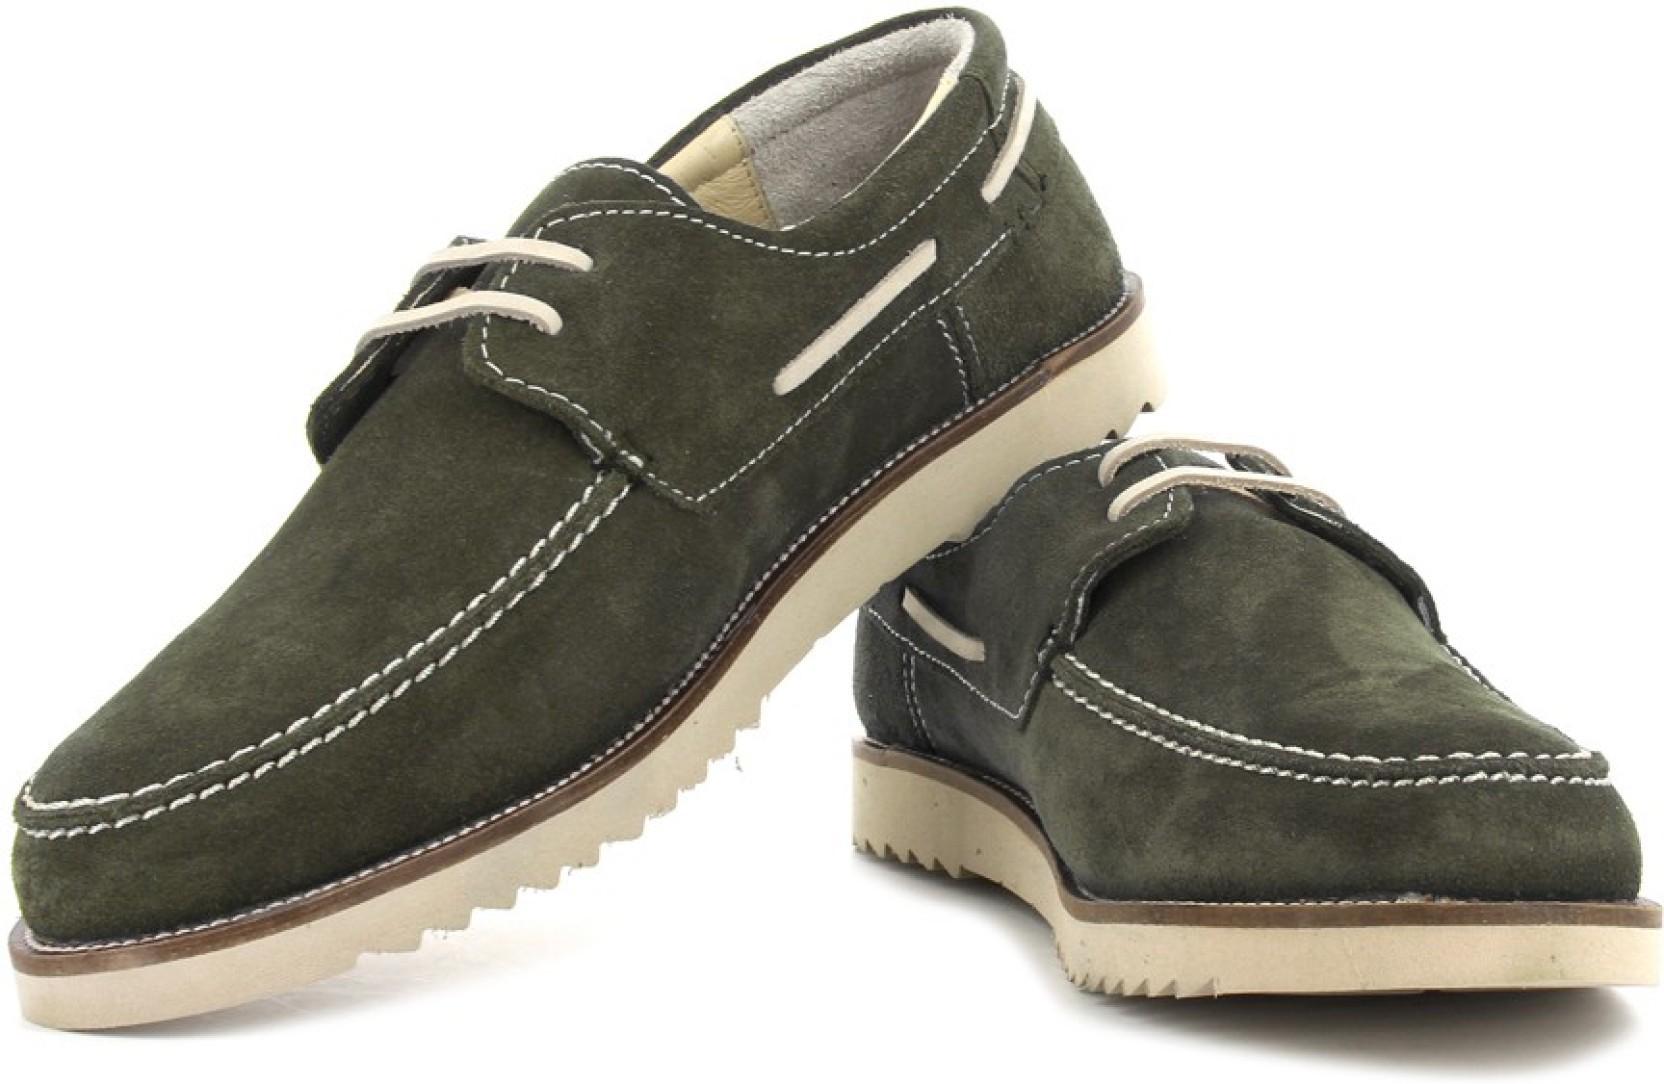 Woodland Boat Shoes - Buy Olive Green Color Woodland Boat ...